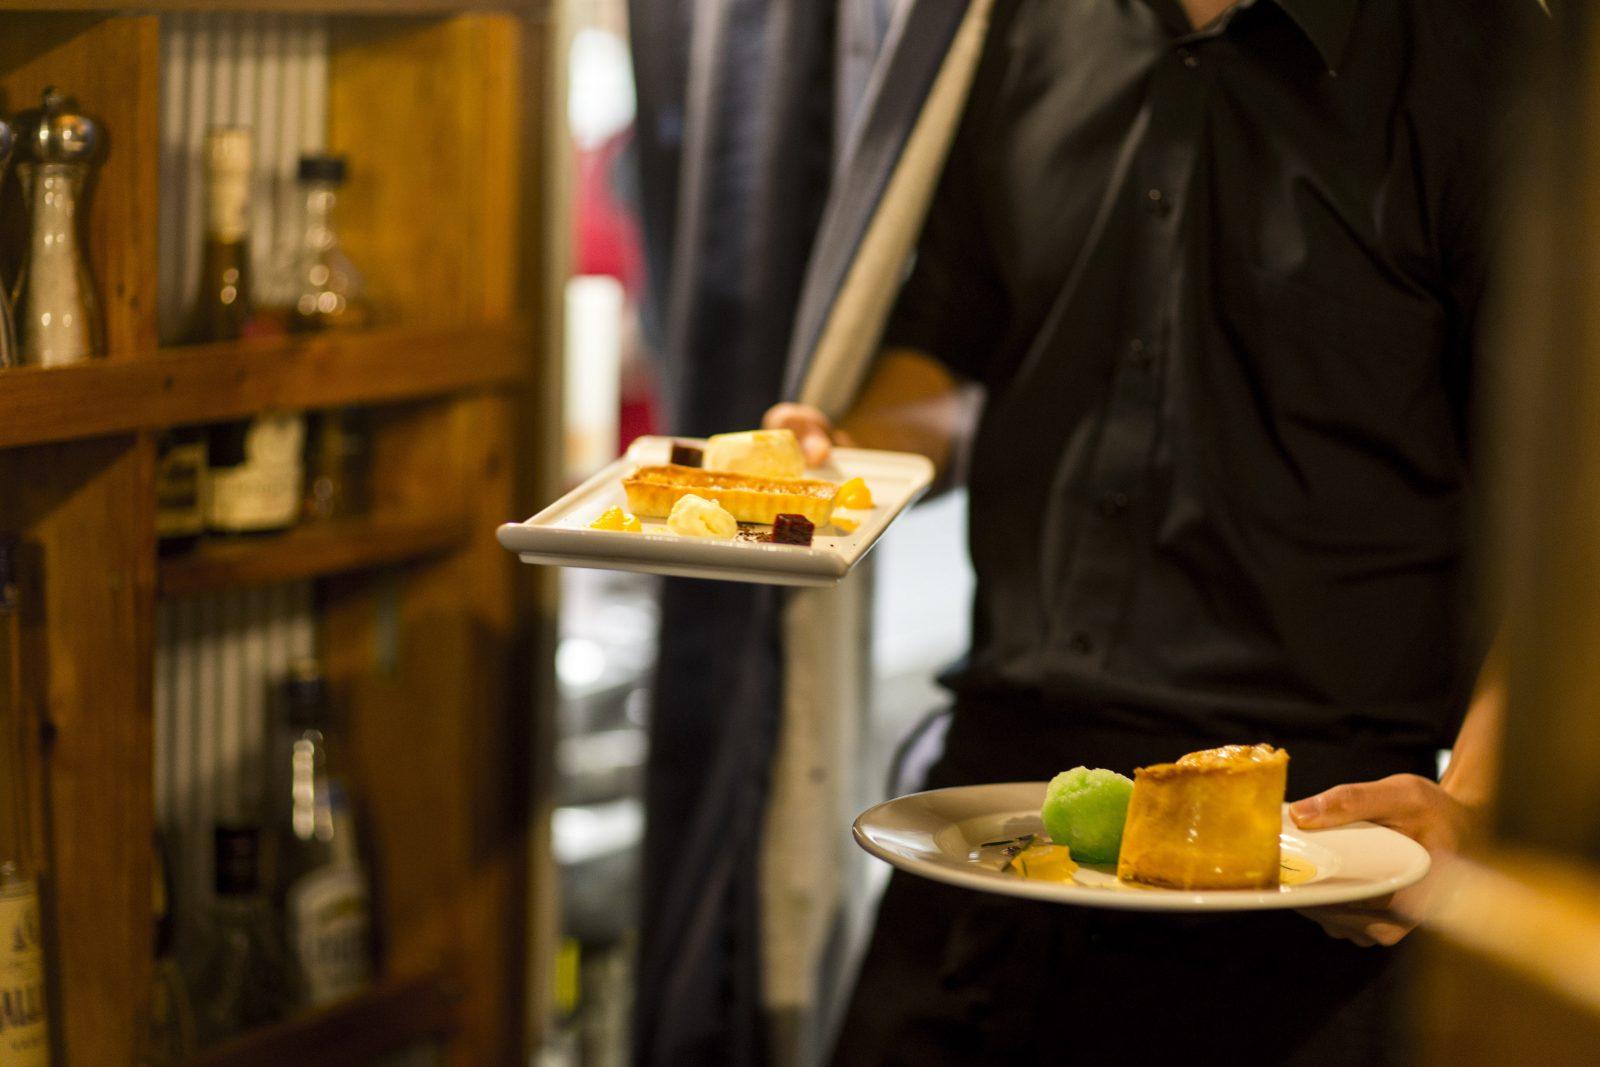 Waiter carrying two plates of desert